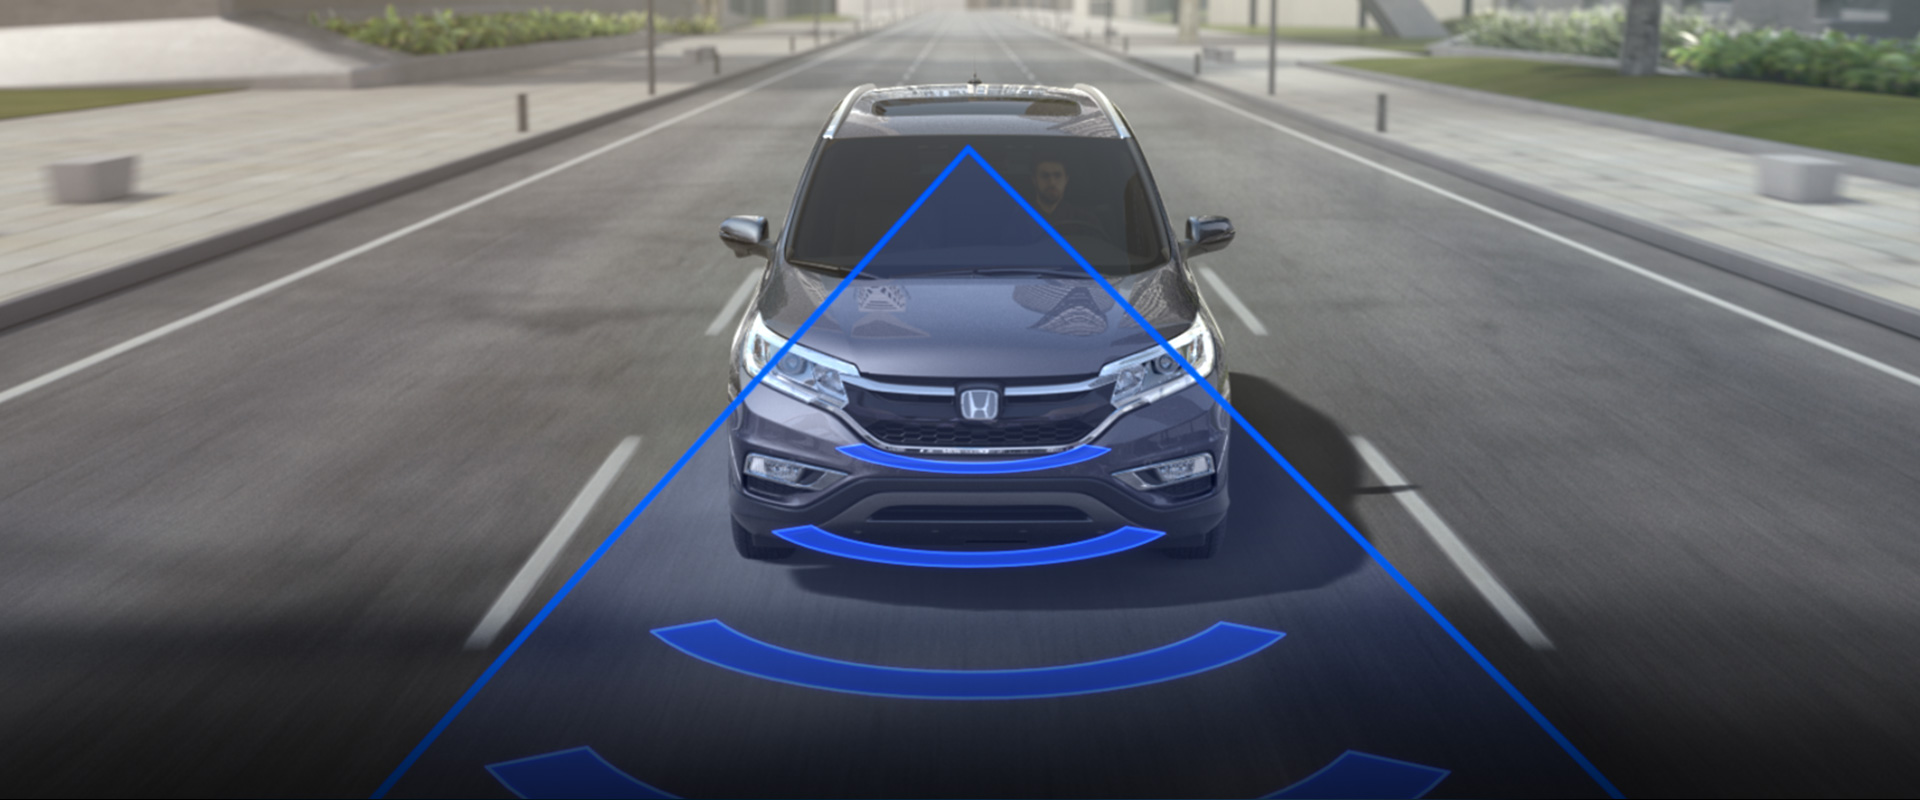 2016-honda-cr-v-collision-mitigation-braking-system